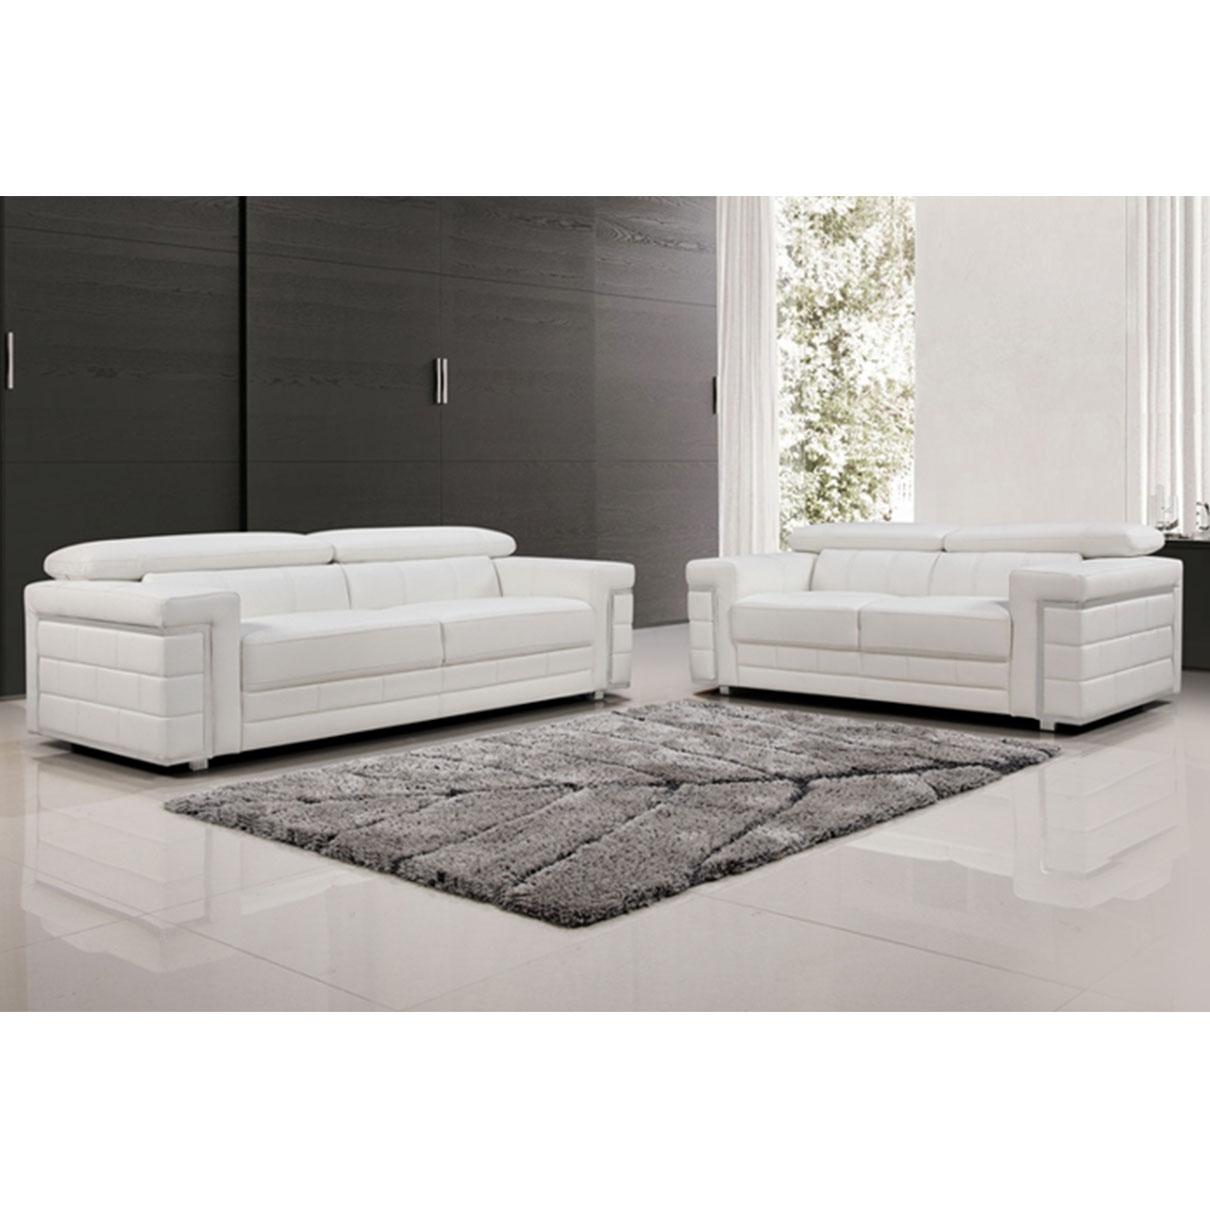 d1 decor-and-design-lounge-suites-white